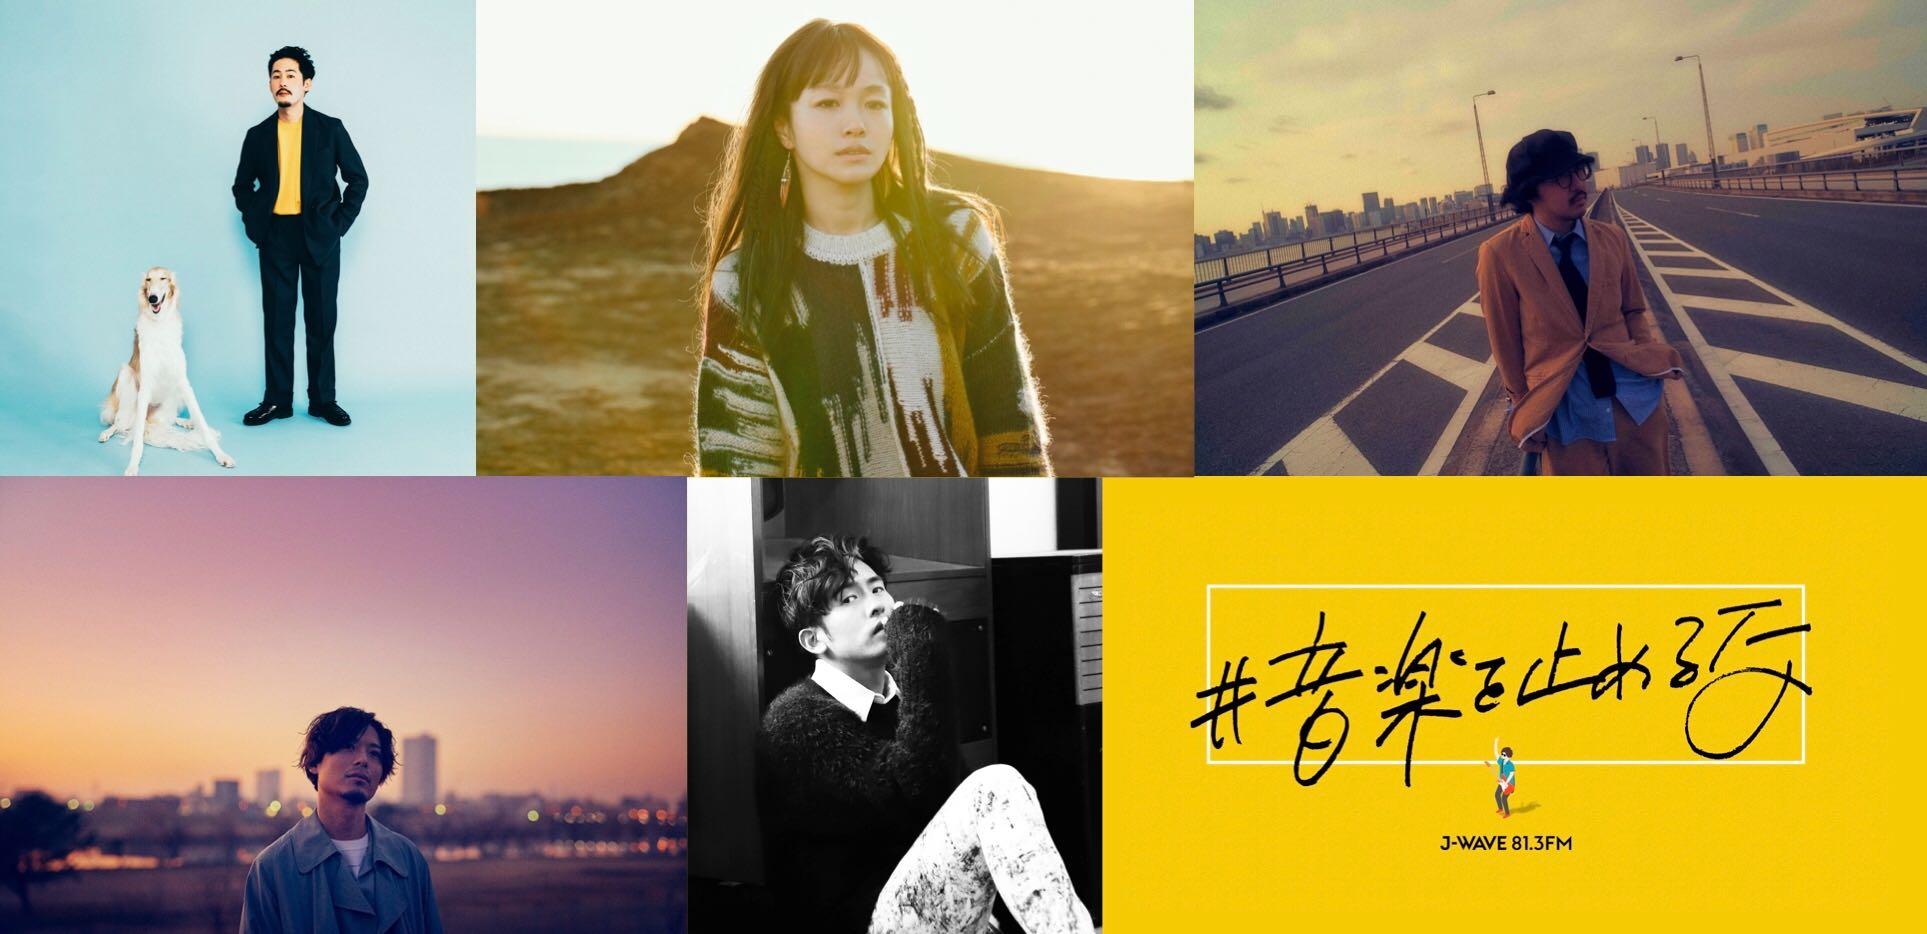 TENDRE、NakamuraEmi、THE CHARM PARK、中田裕二、Kが無観客ライブ! J-WAVEで生中継【#音楽を止めるな】